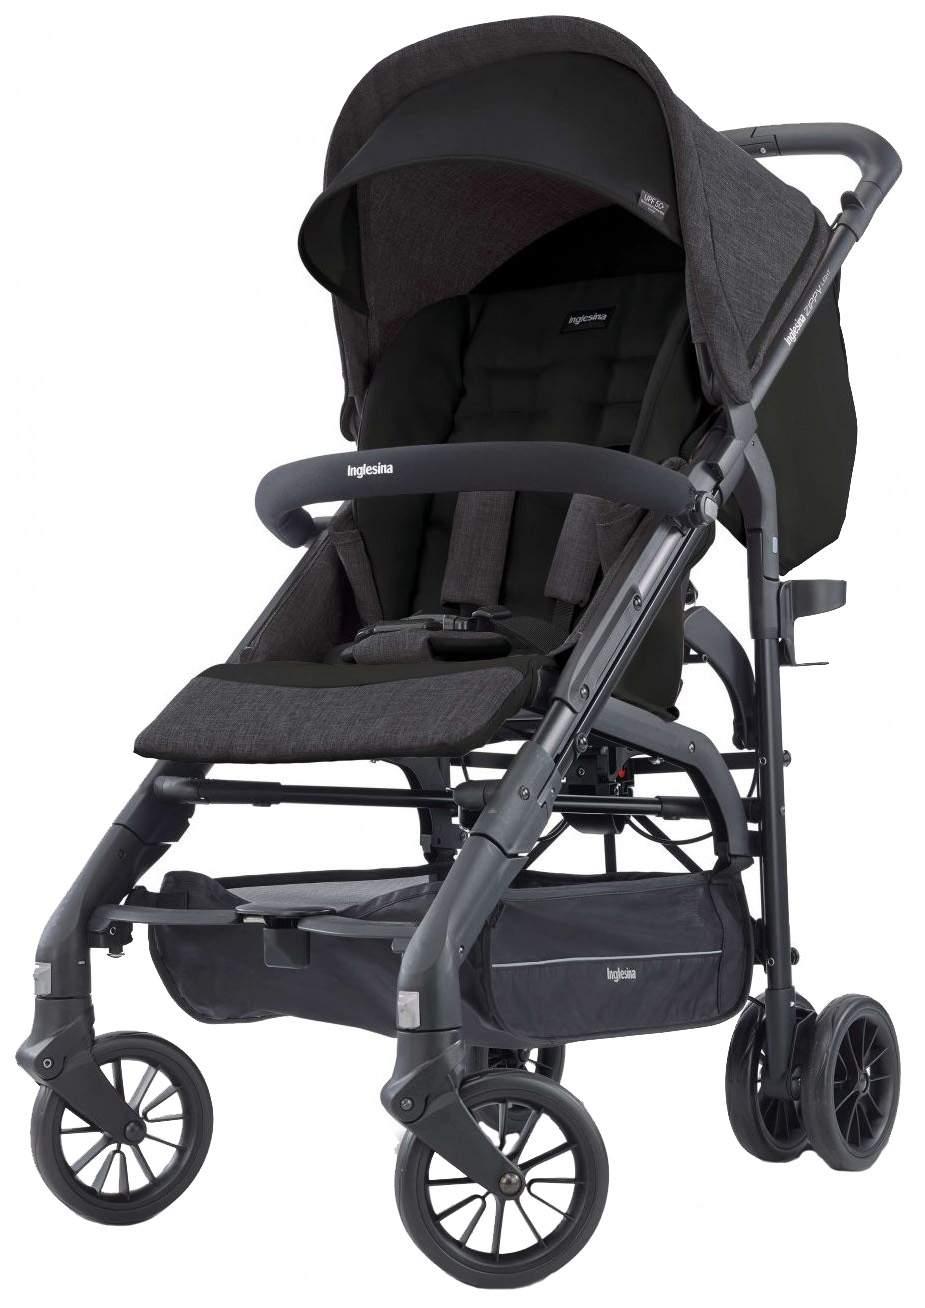 Прогулочная коляска Inglesina Zippy Light VOLCANO BLACK